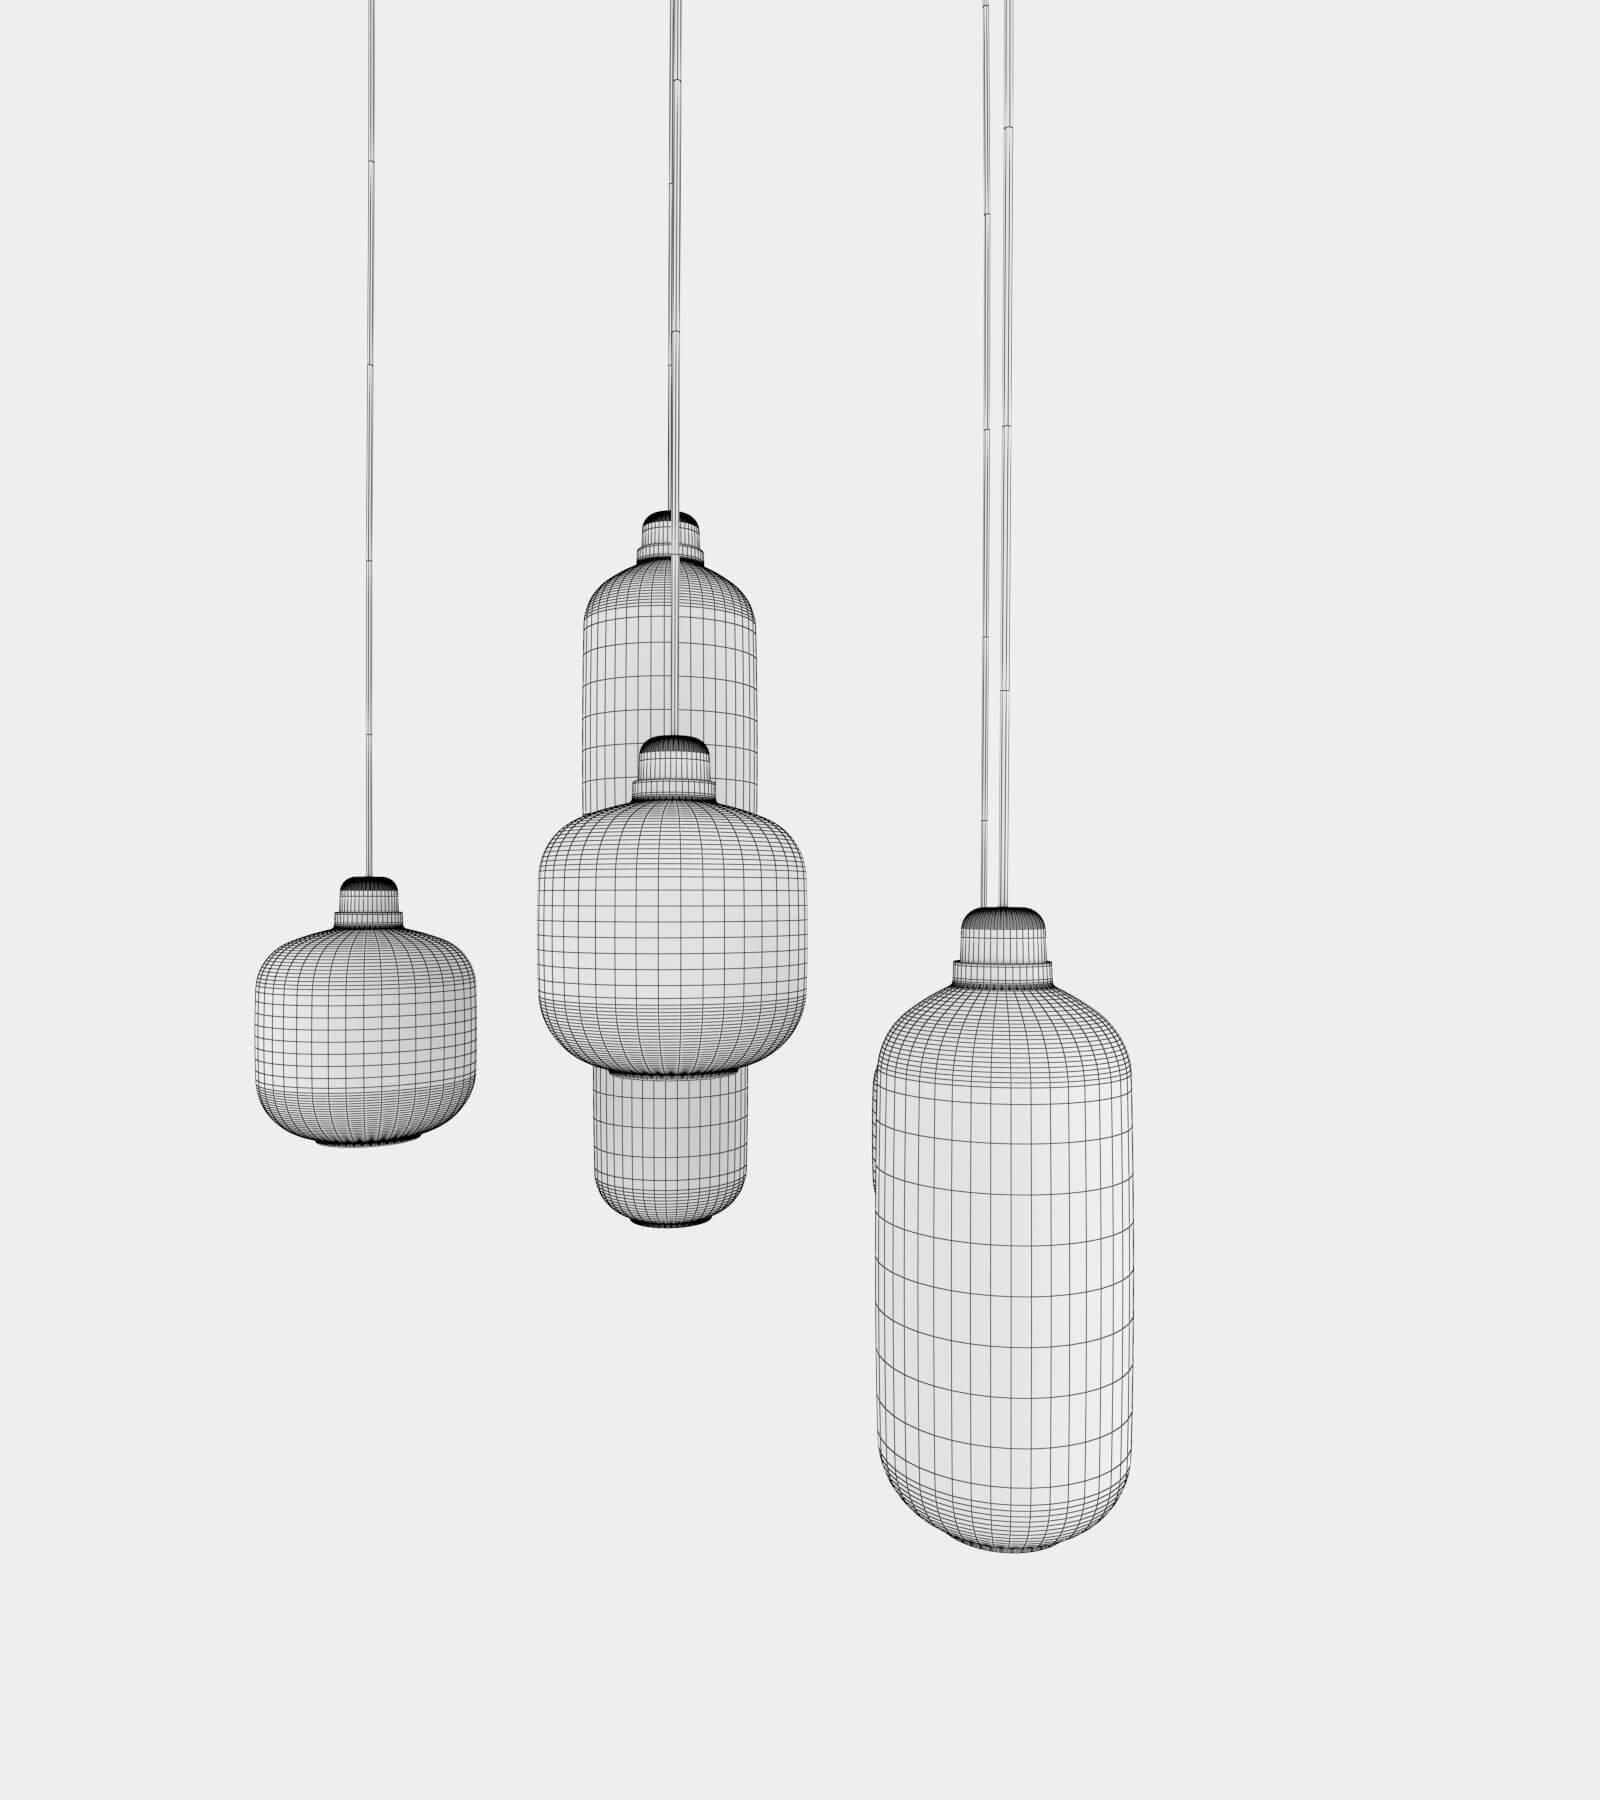 Retro round ceiling lamp set-wire-2 3D Model